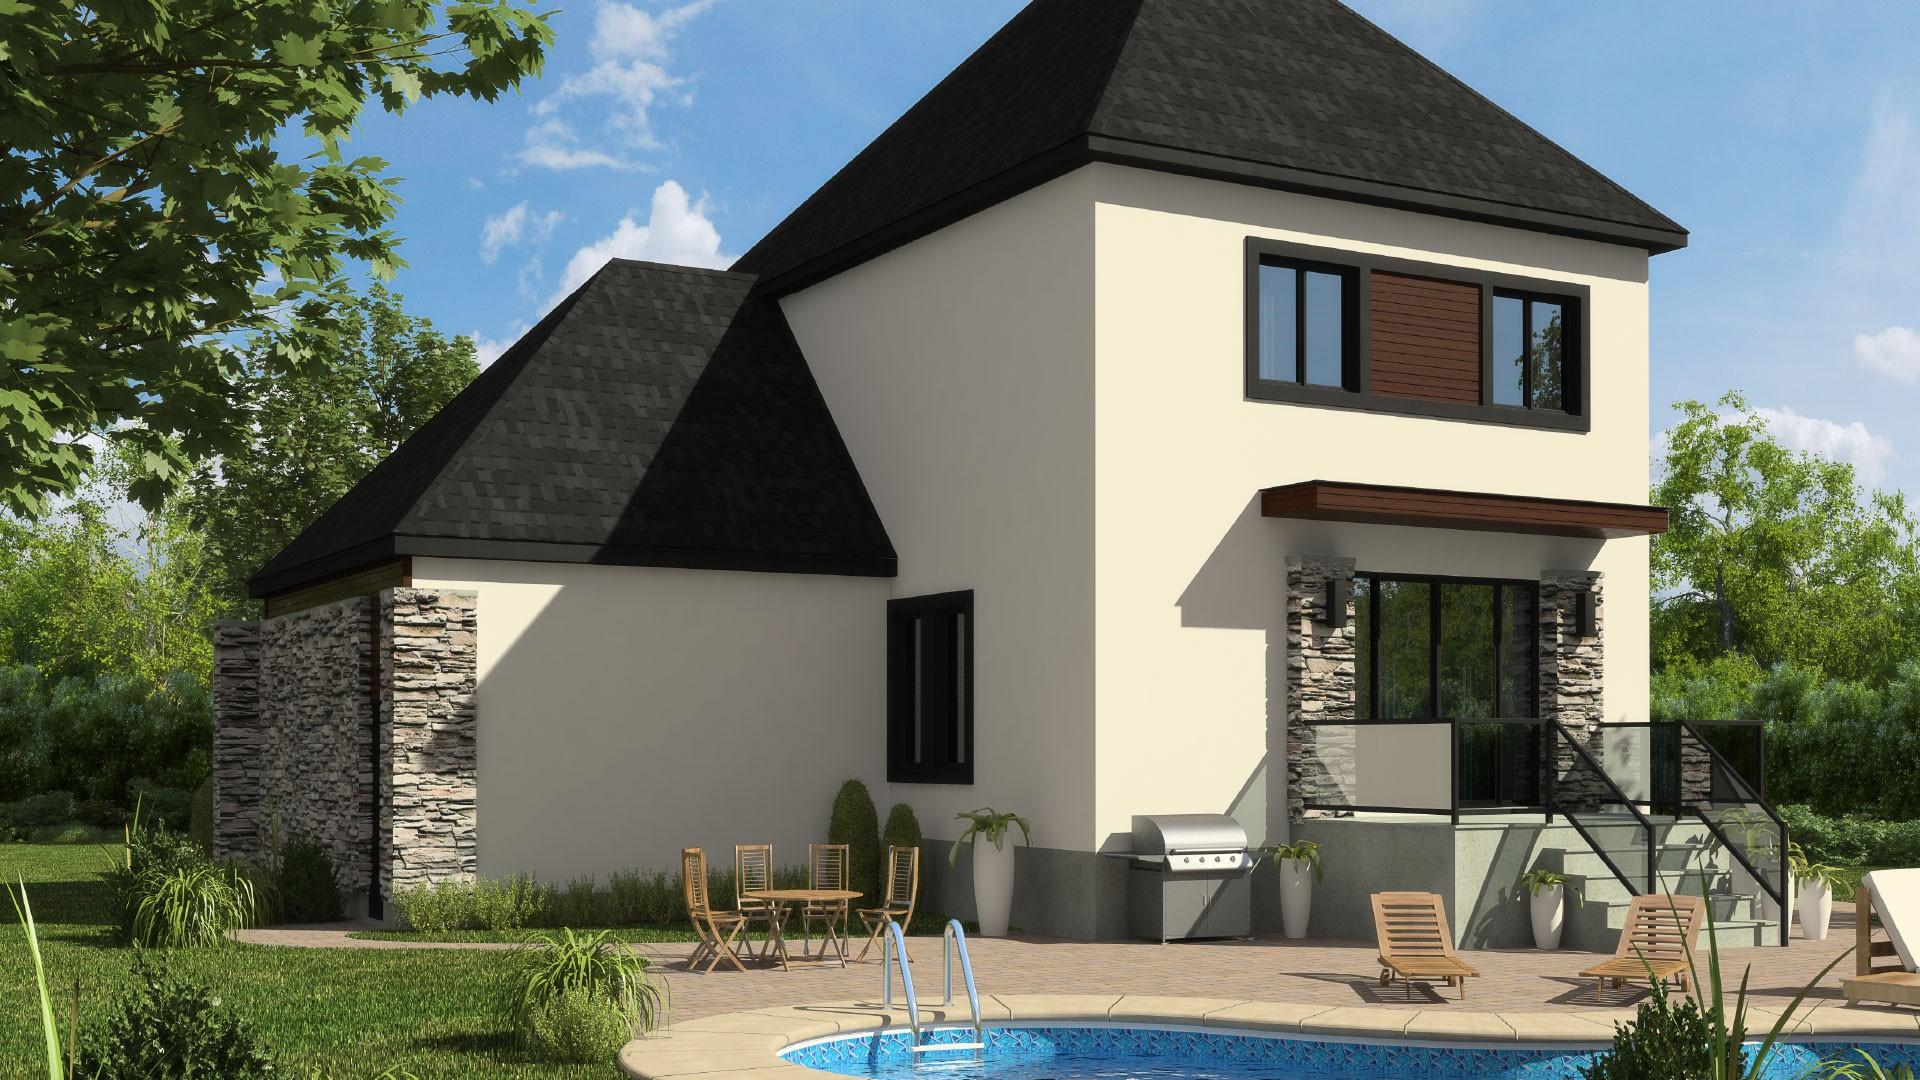 Cottage_Contemporain_Estrella_Maison de prestige_Domicil